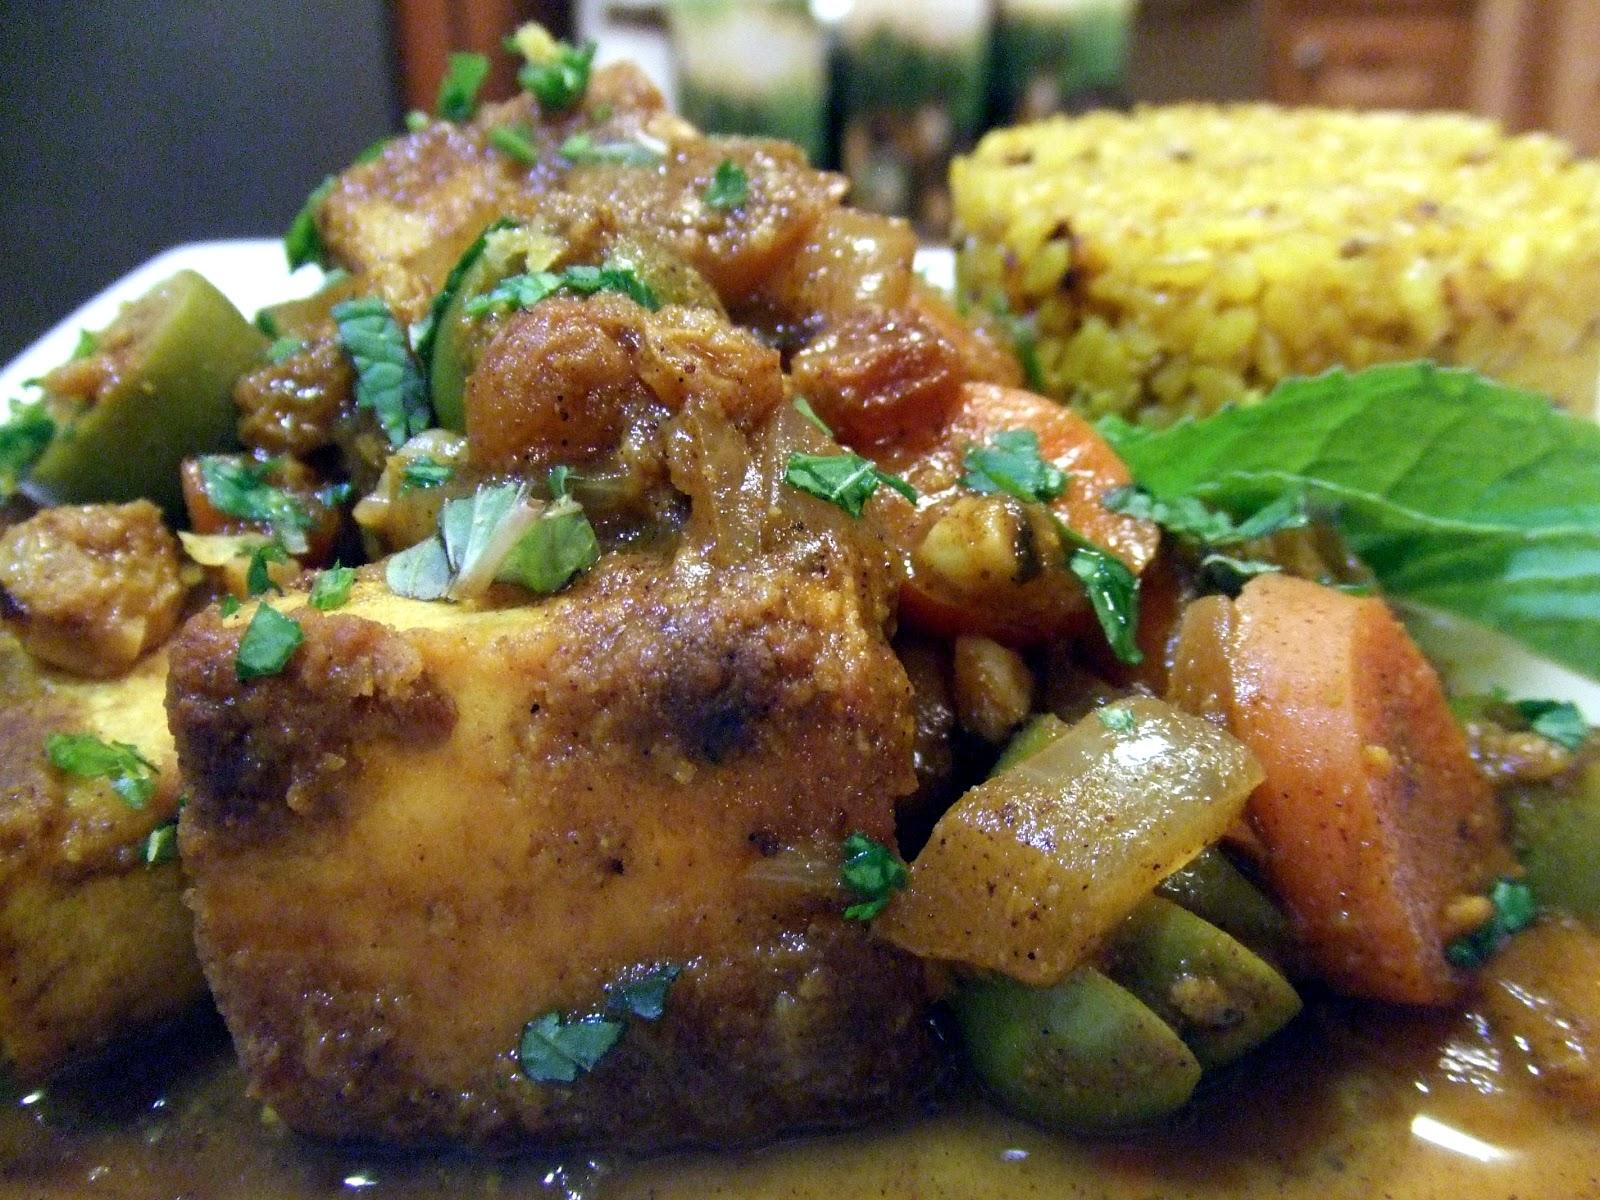 Casbah Tofu